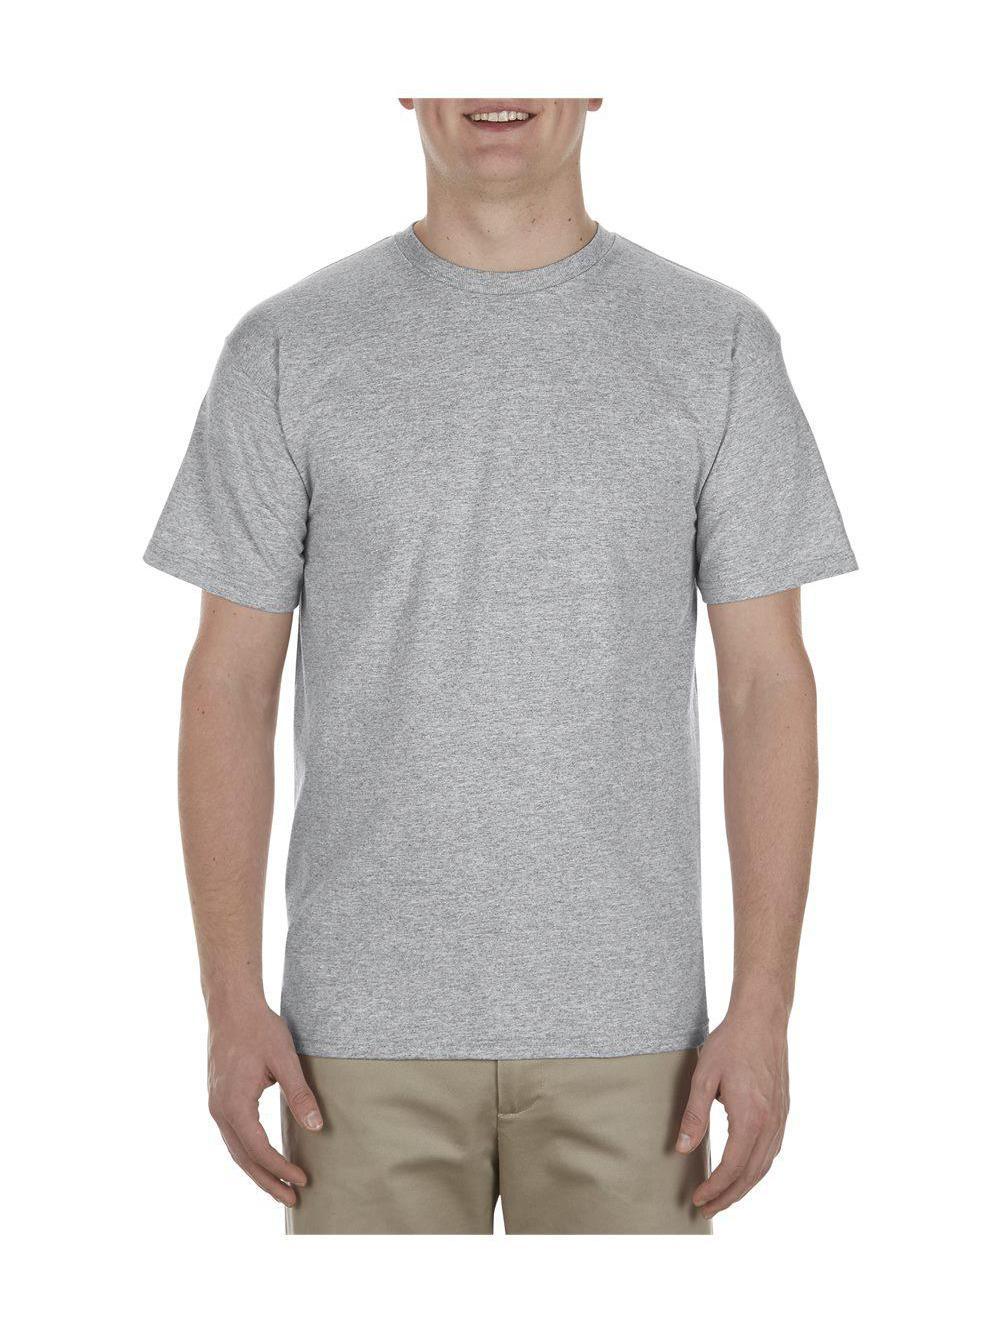 ALSTYLE-Premium-T-Shirt-1701 thumbnail 3